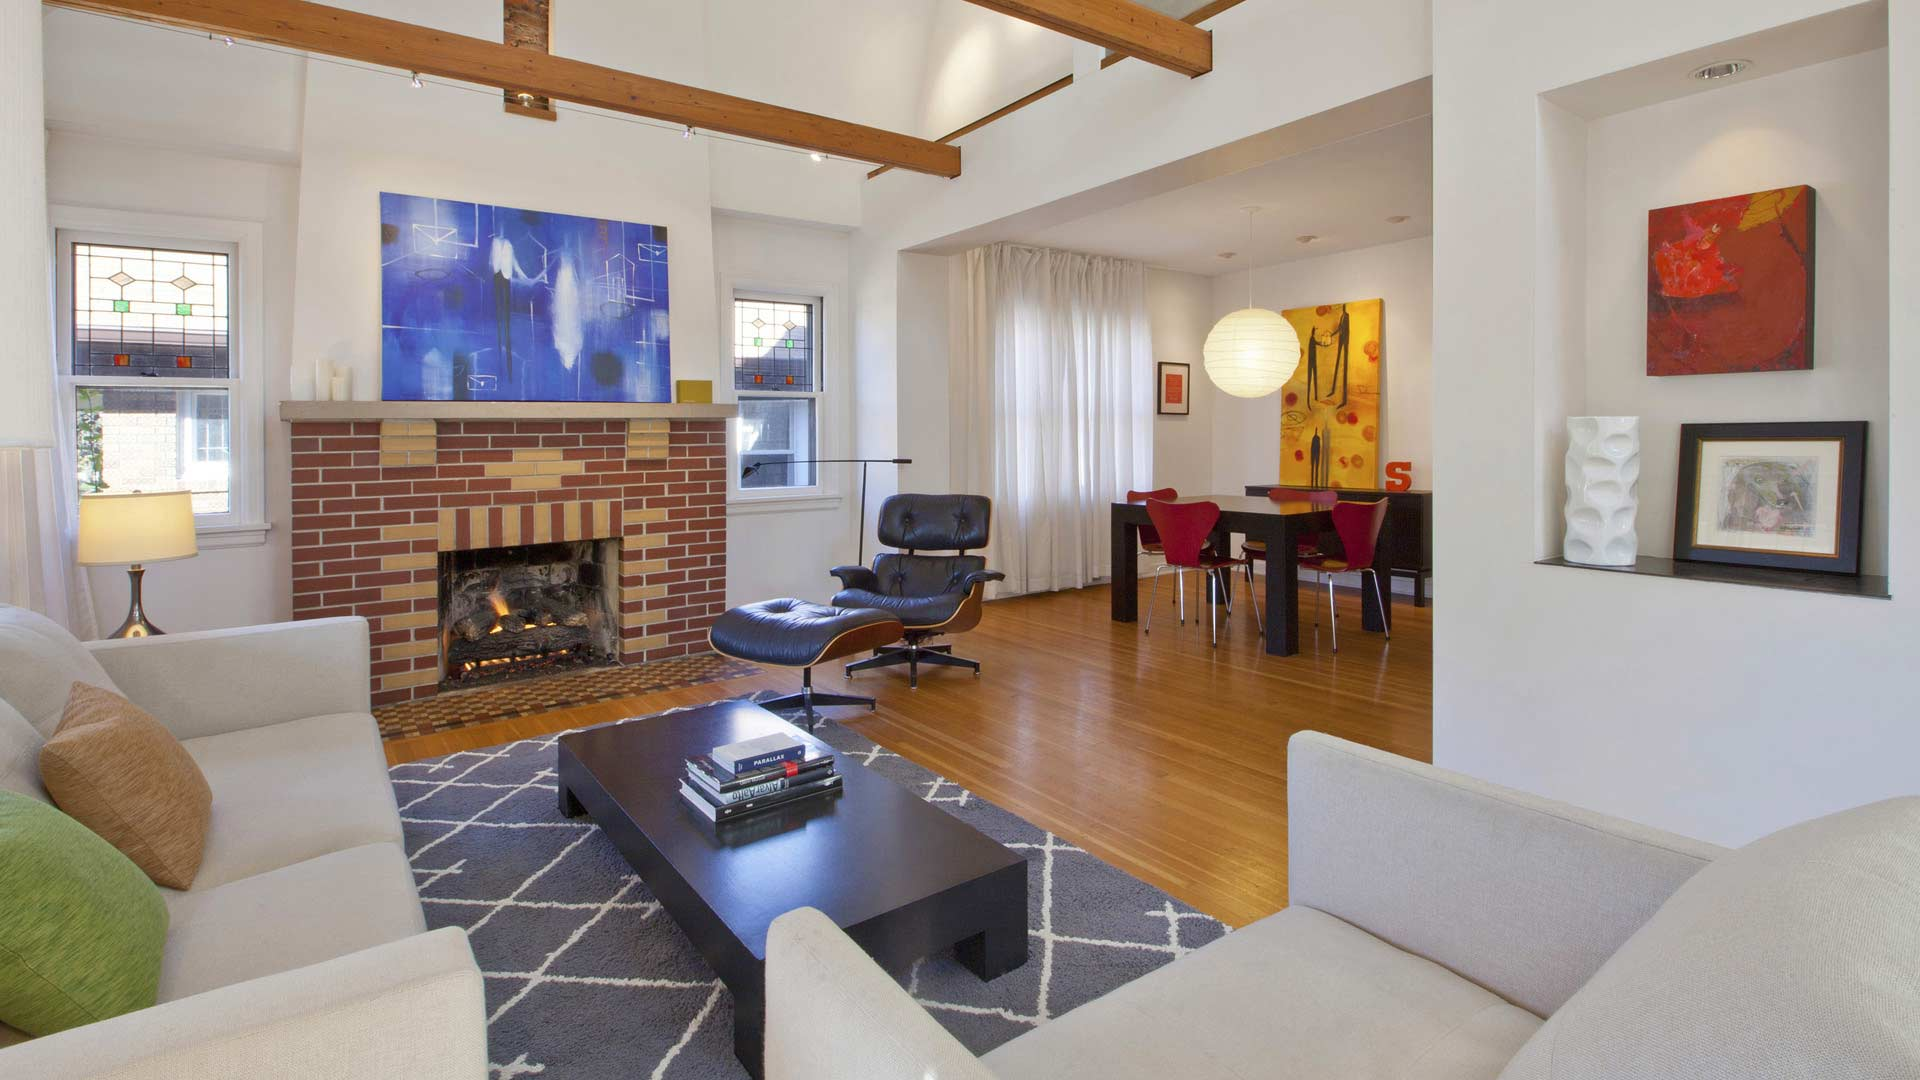 Classic Irvington Tudor Remodel - Front Room - Christopher Short, Architect, Indianapolis, HAUS Architecture